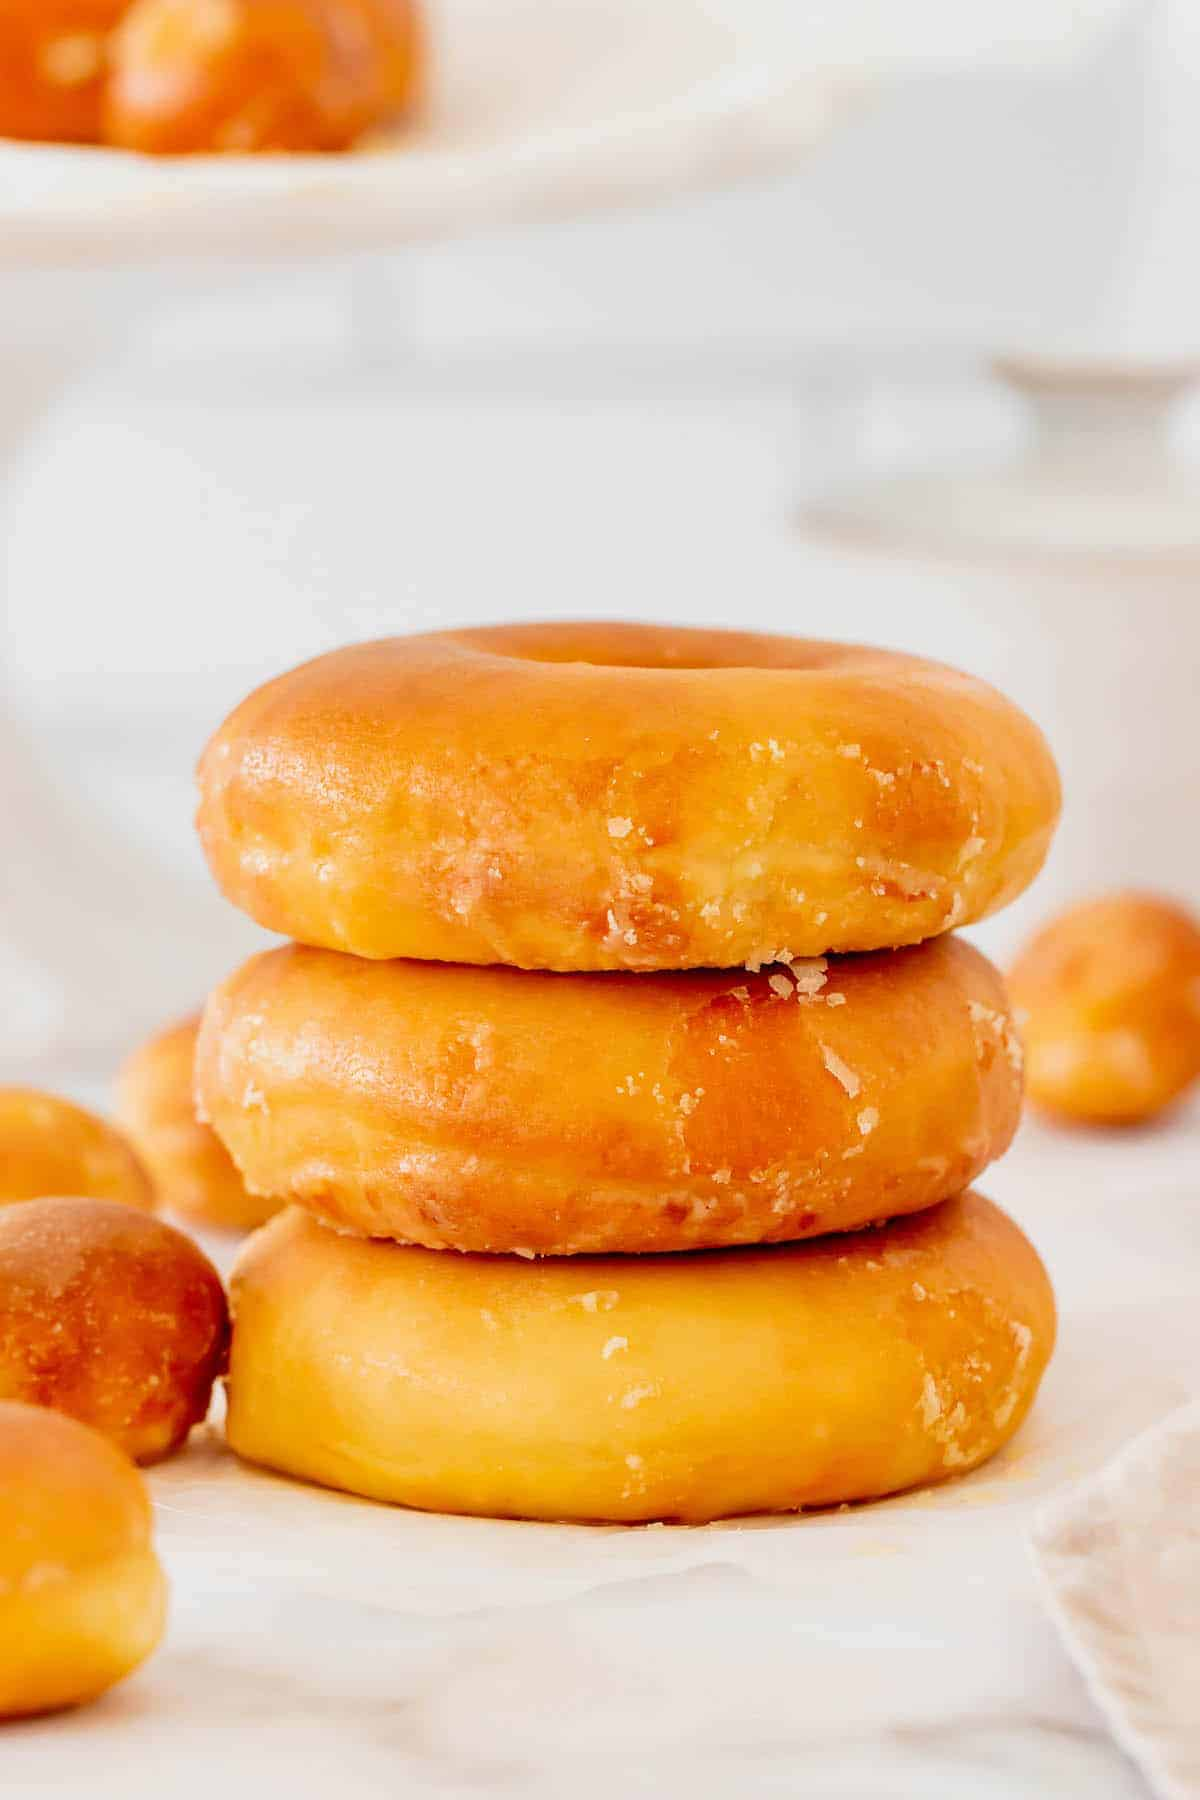 A Stack of Three Homemade Donuts with Vanilla Glaze